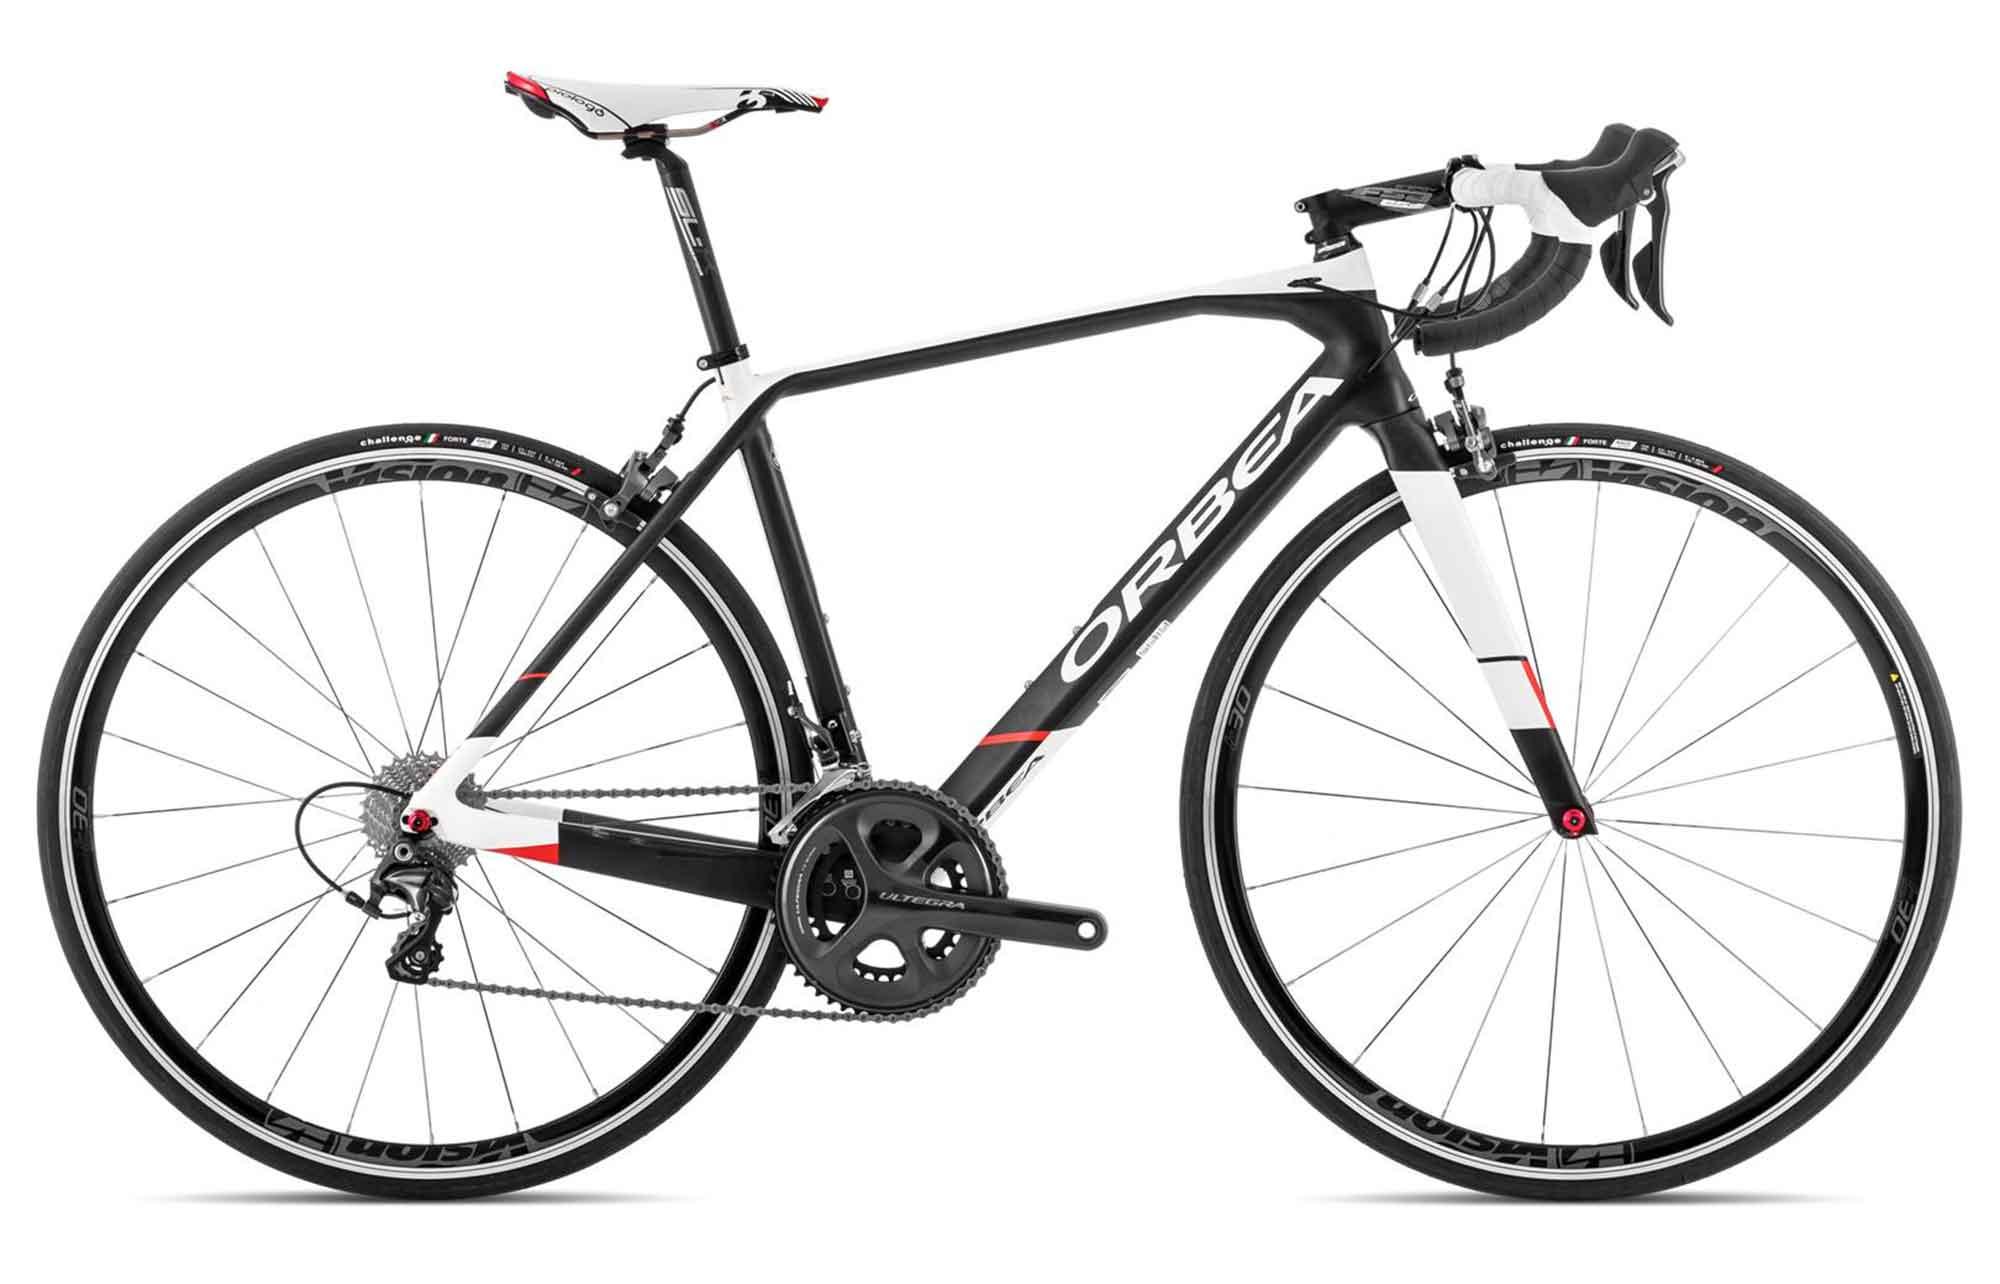 2015 Orbea Orca M20 Bike R A Cycles